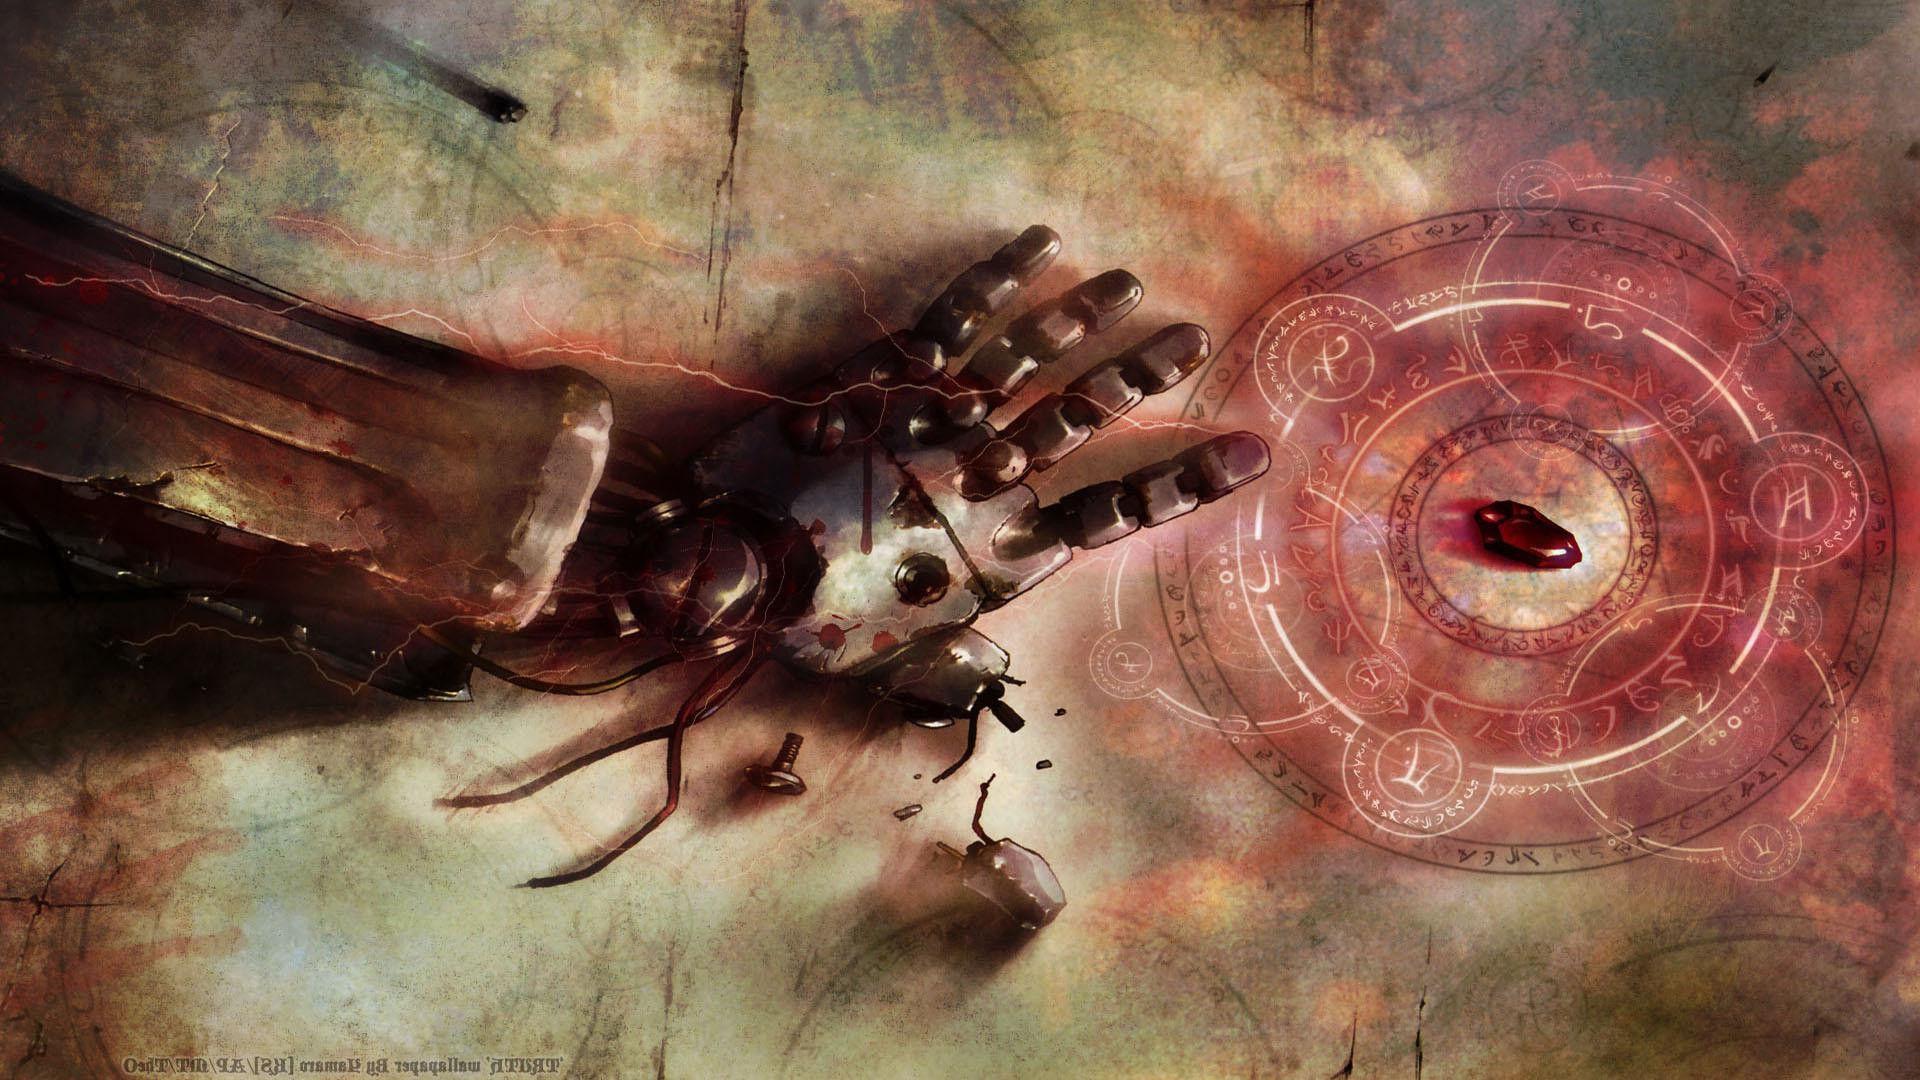 Full Metal Alchemist Artwork Fullmetal Alchemist Alchemist Fullmetal Alchemist Brotherhood